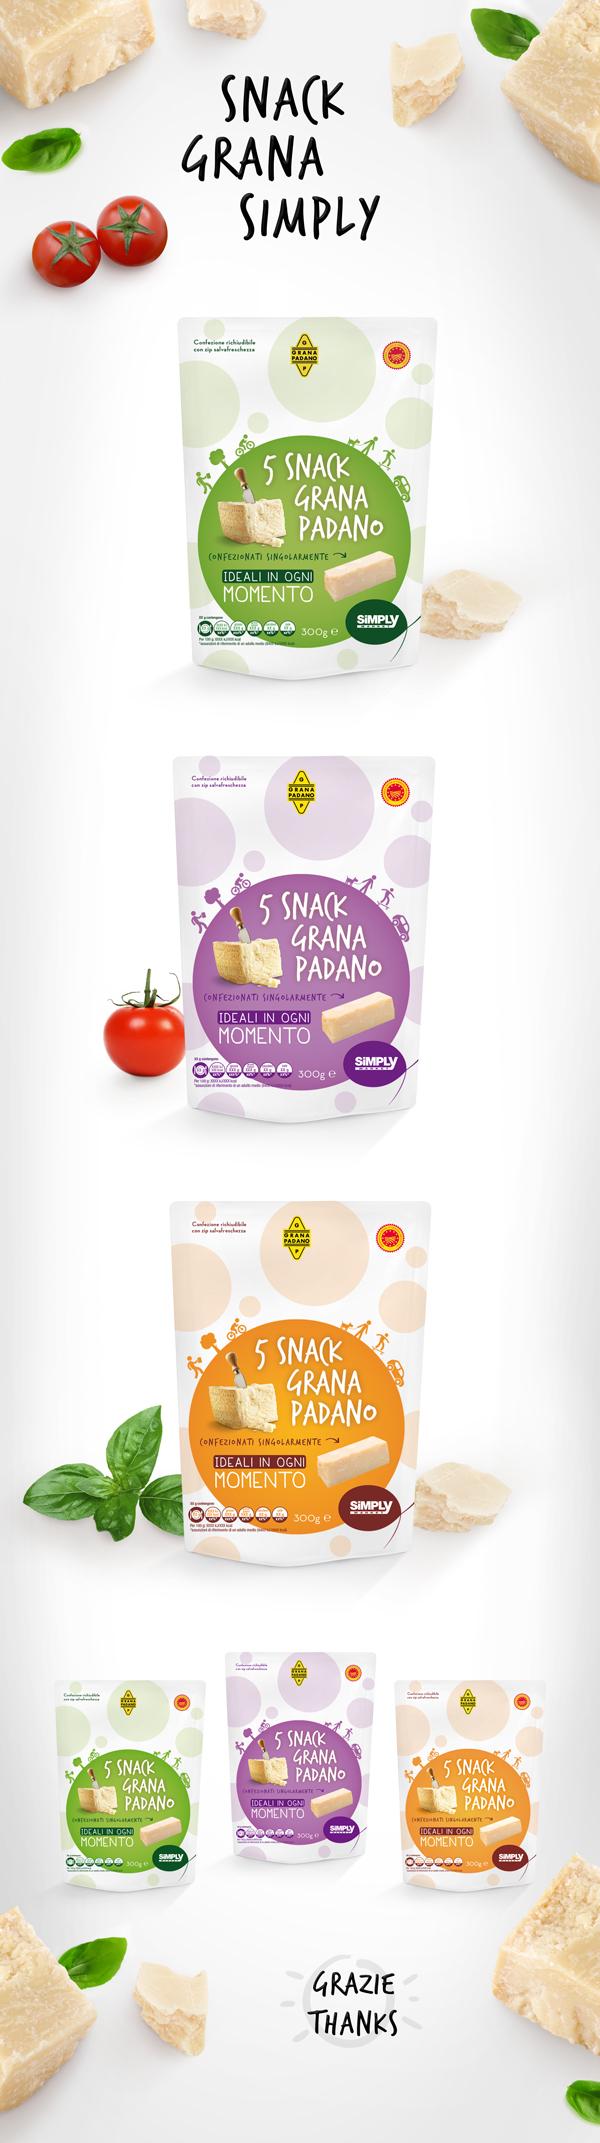 Pack parmigiano granapadano formaggio Cheese graphic Italy italian Food  Cibo fooddesign simply market colors pois